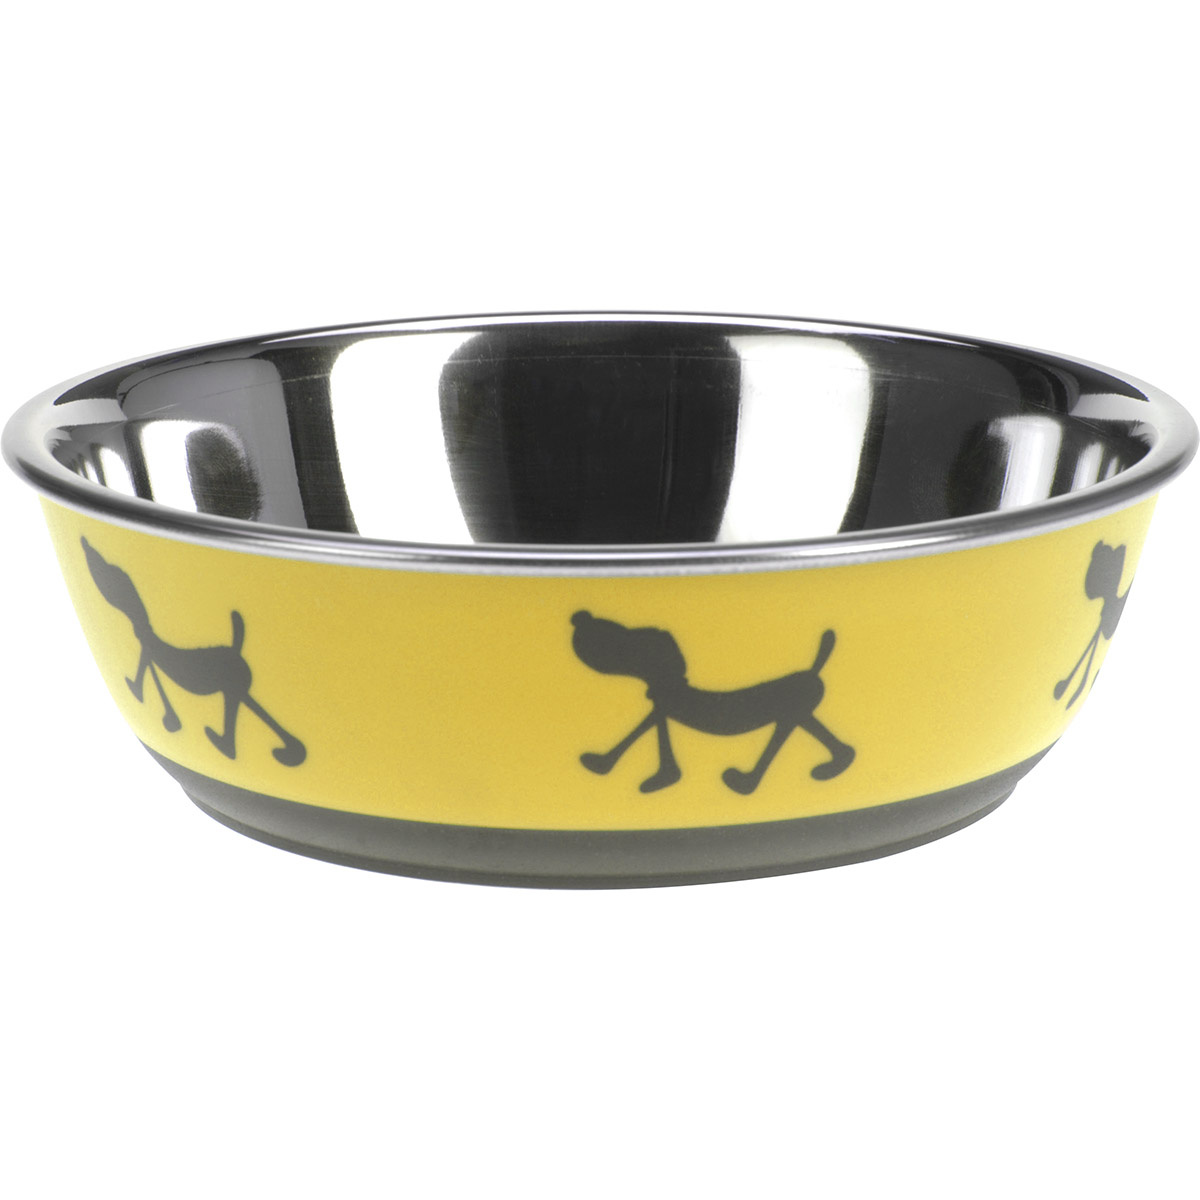 Miska pre psa Doggie treat žltá, pr. 17,5 cm